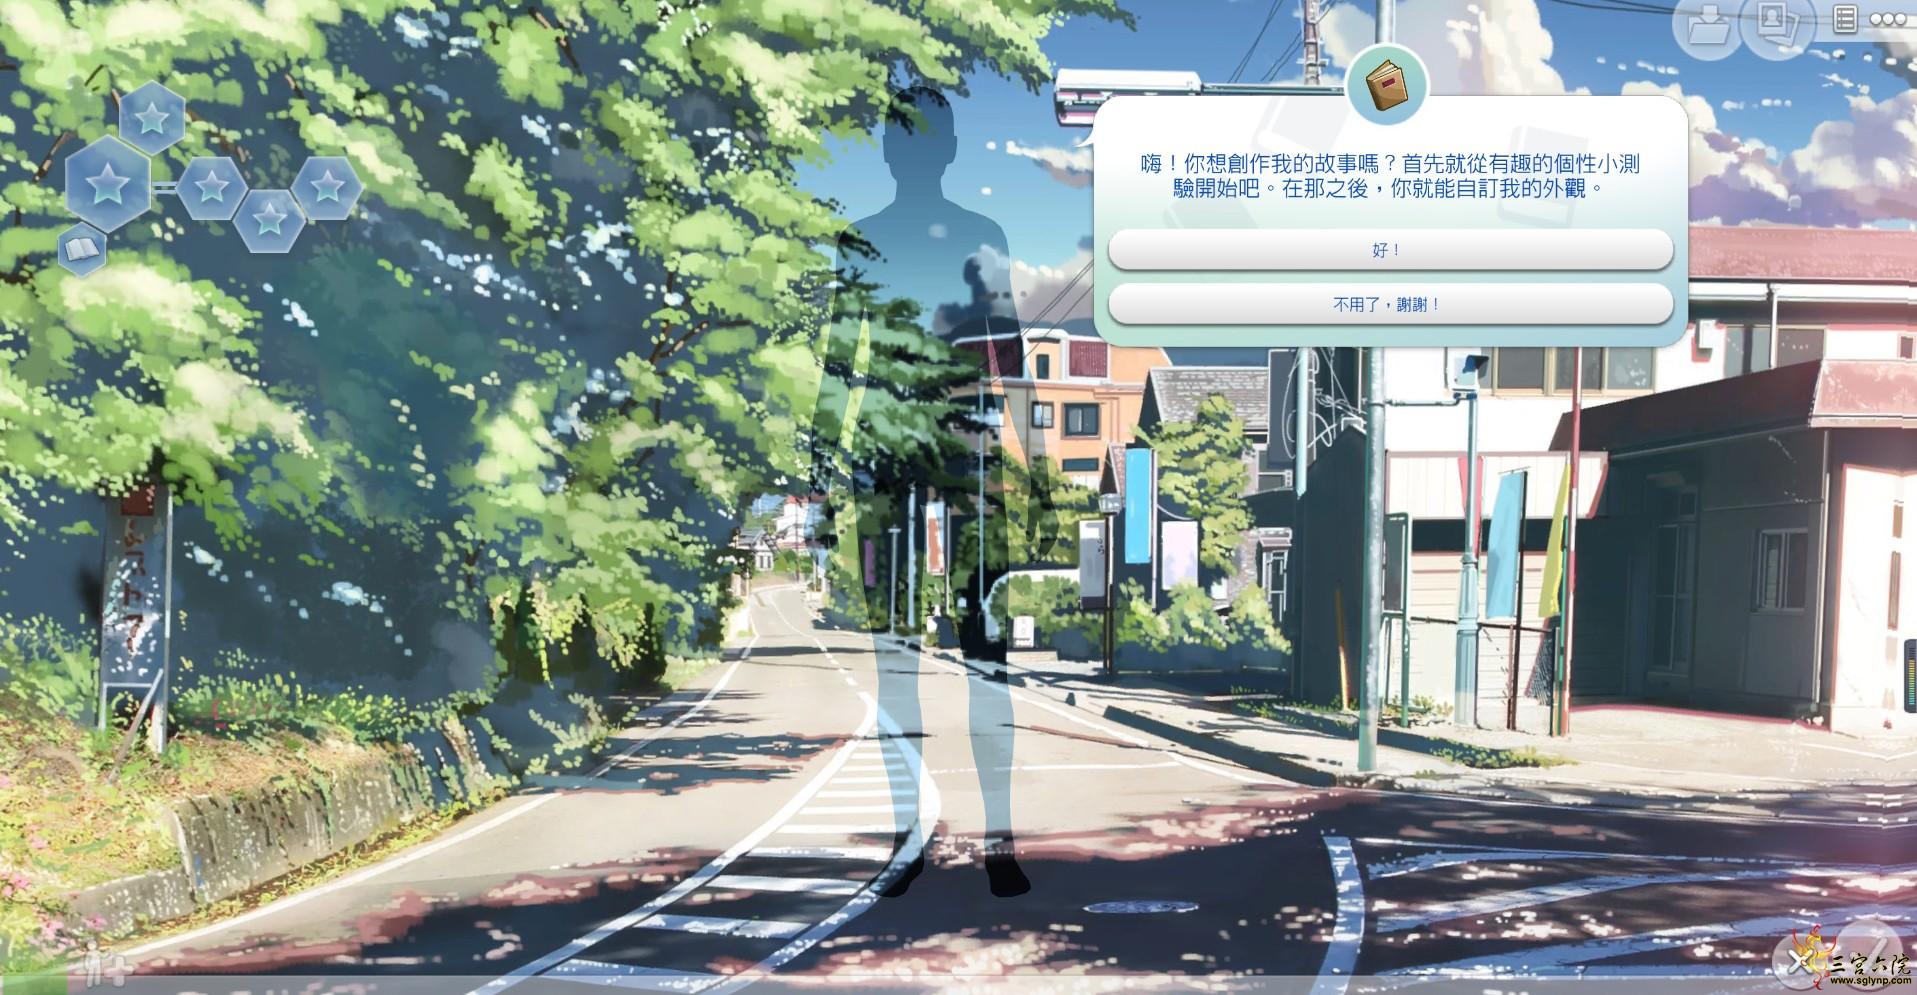 [xinxin]二次元火车站街道CAS背景.png